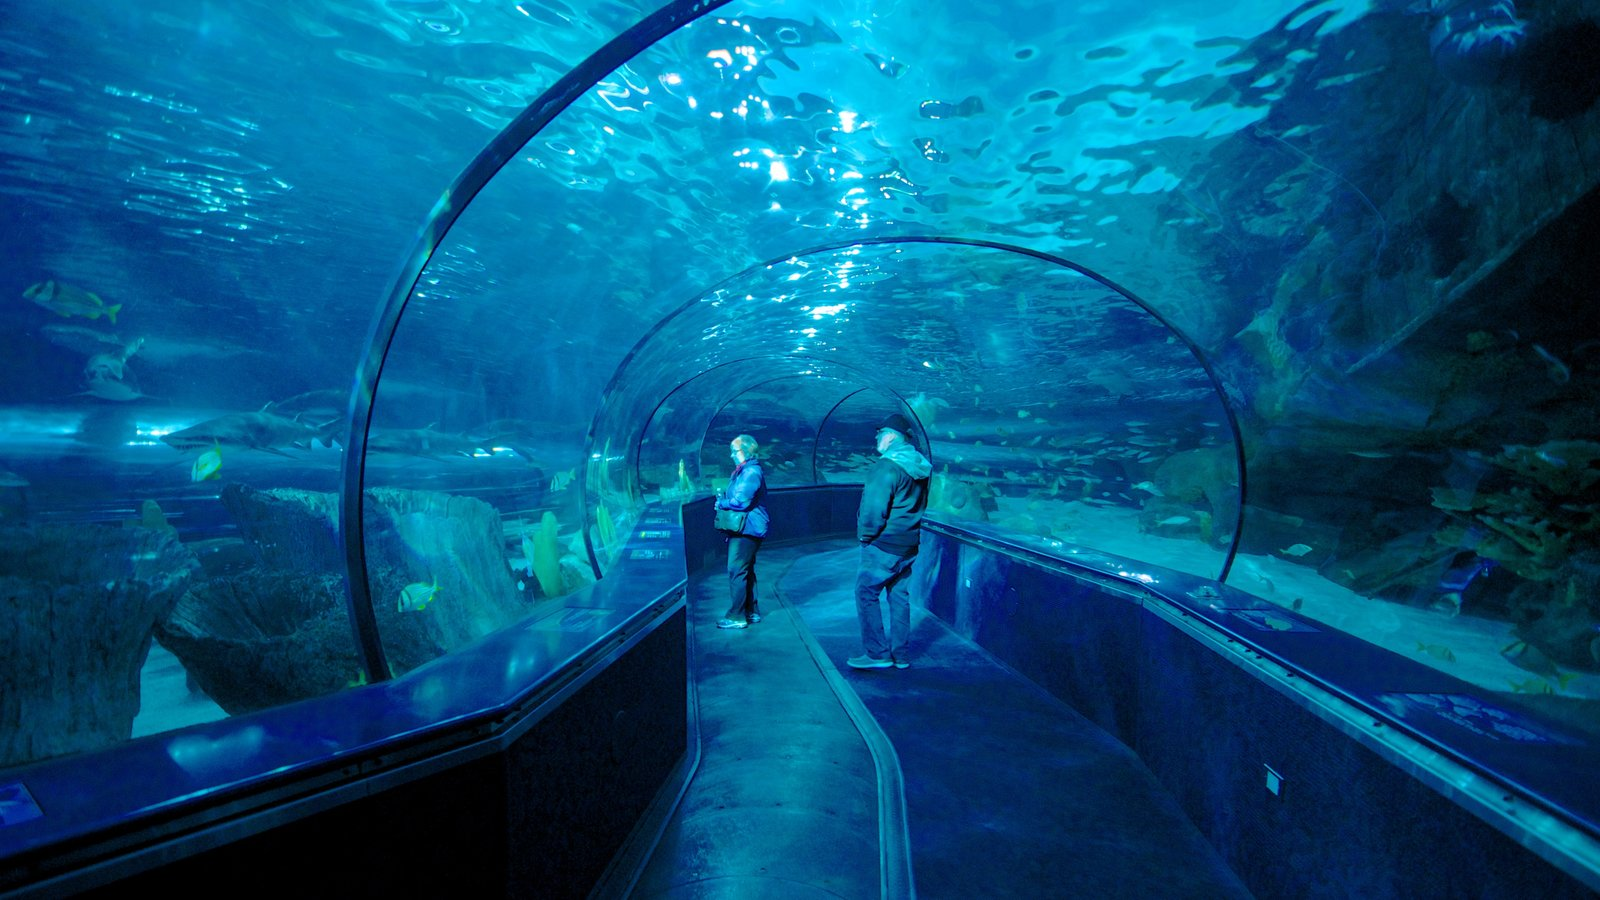 Ripley\'s Aquarium caracterizando vistas internas e vida marinha